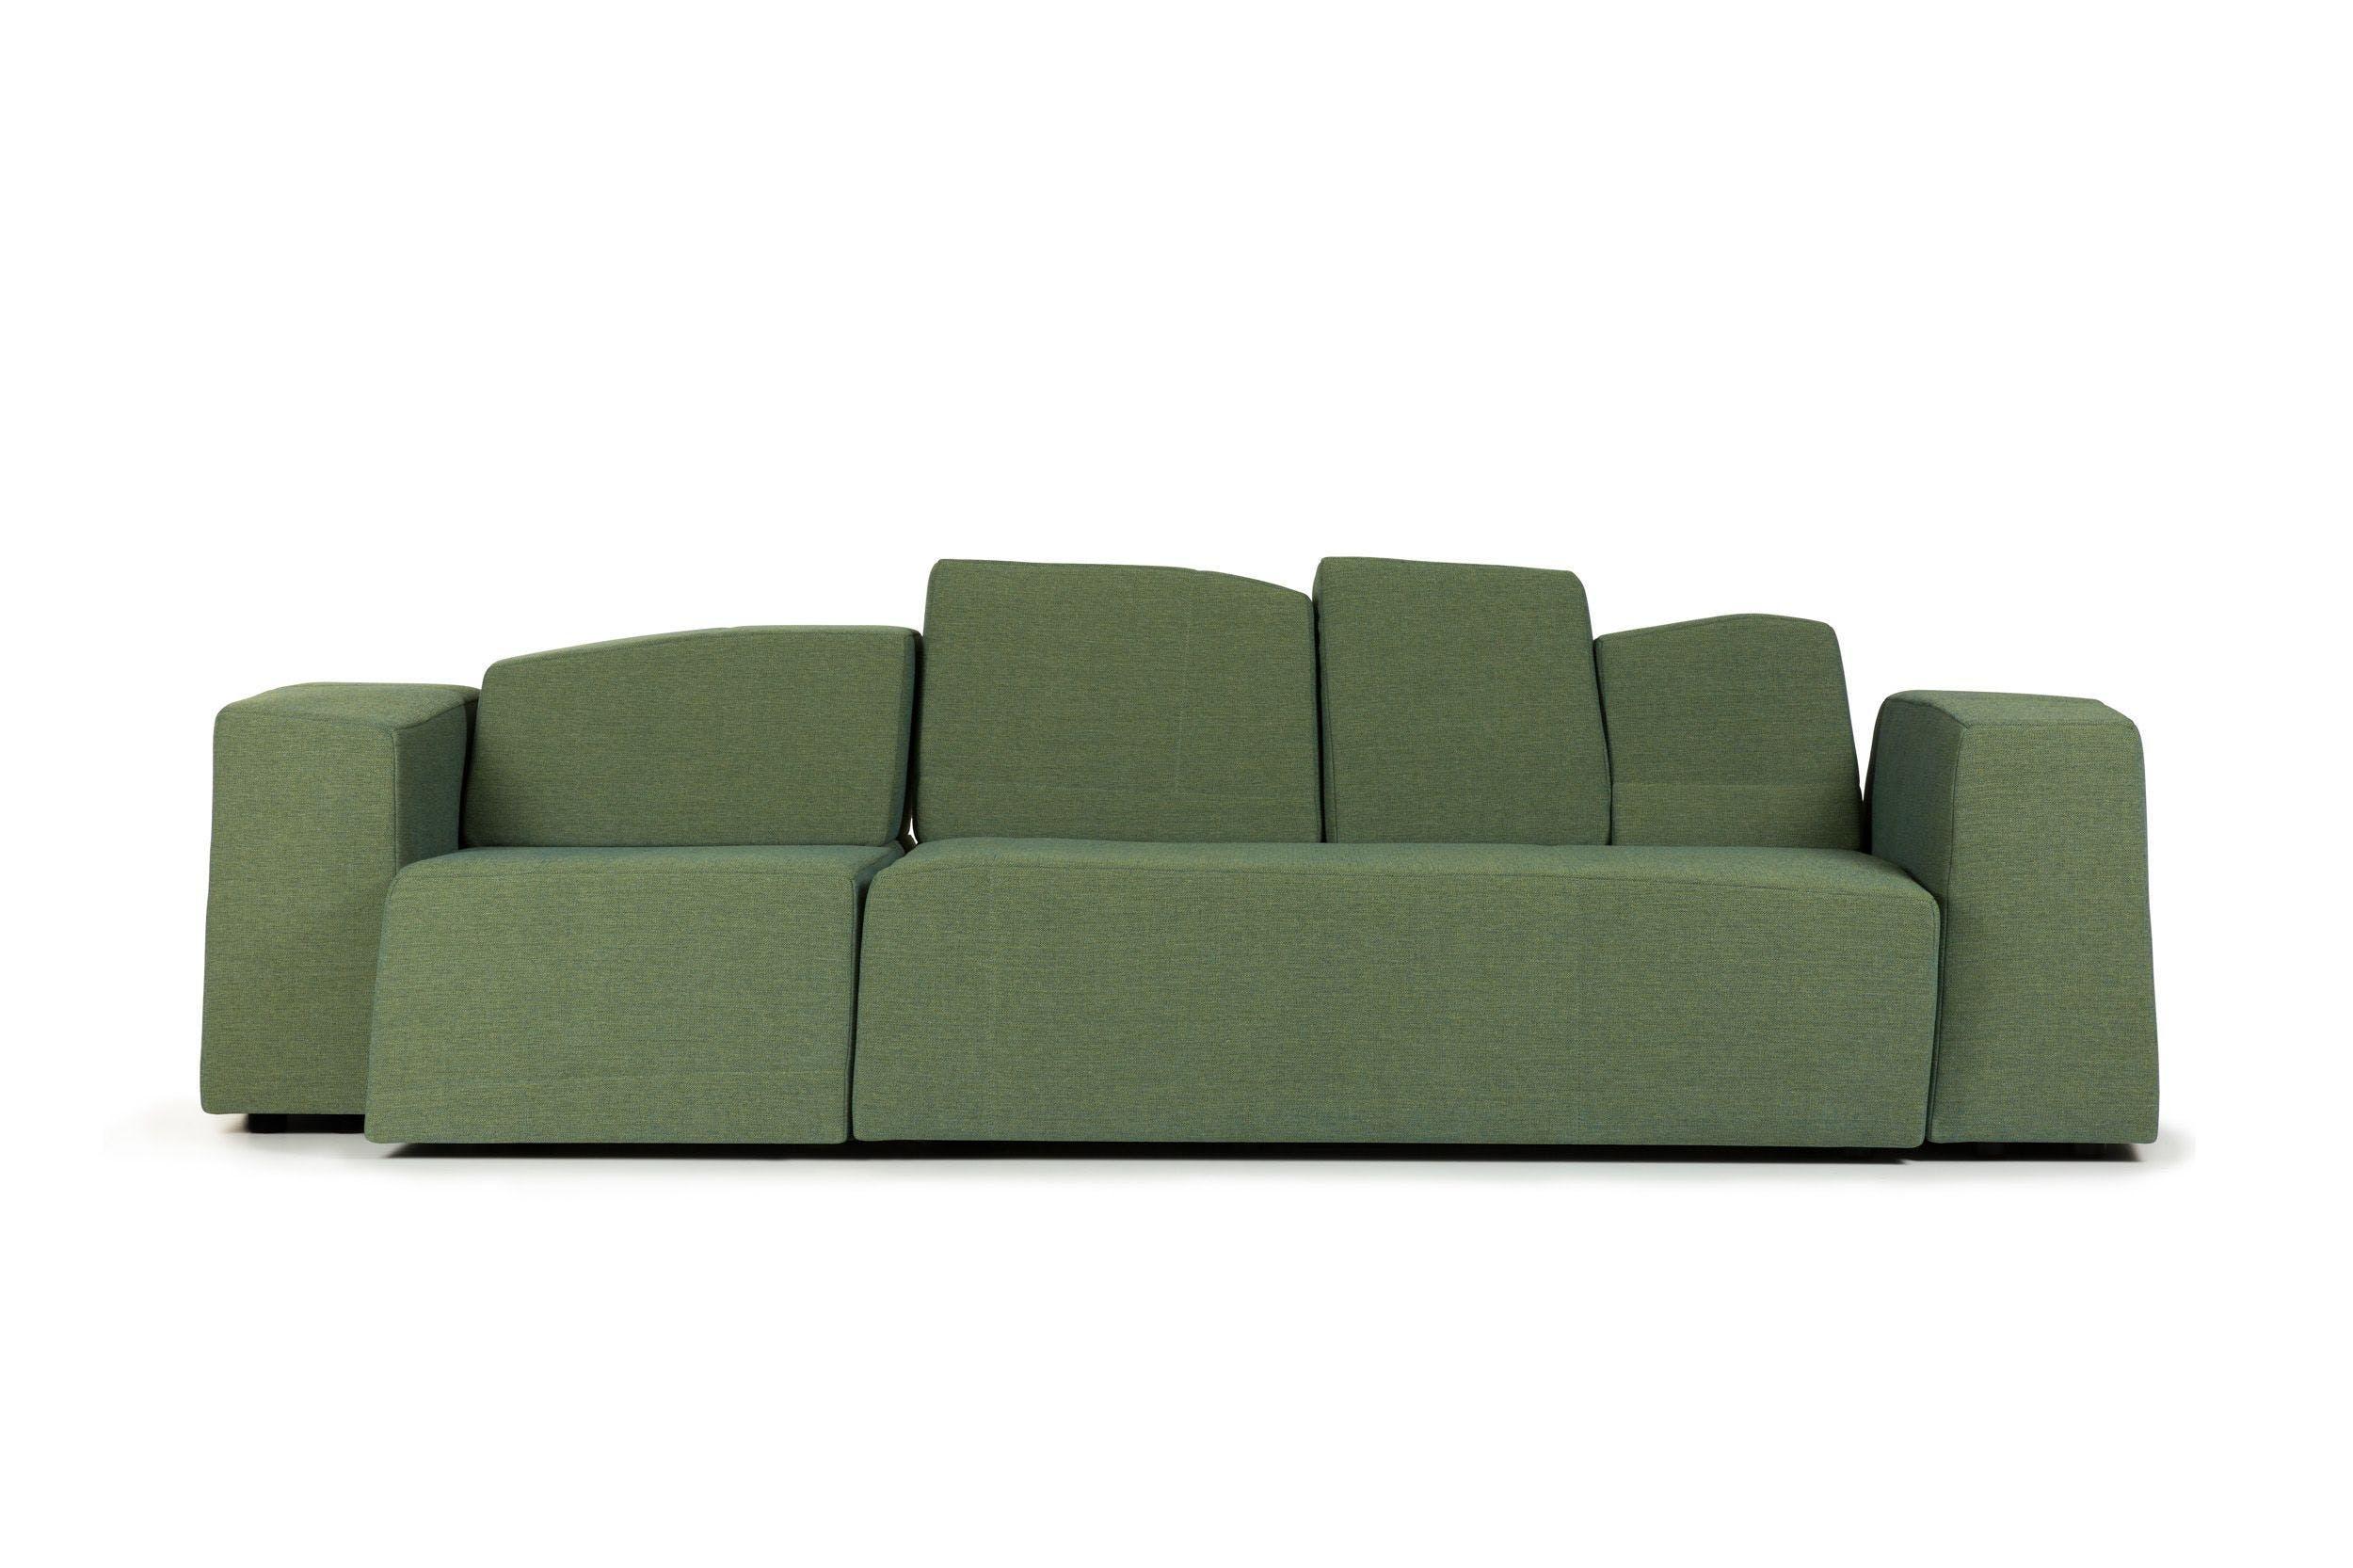 Something Like This Sofa Justo Alge Front 1 Moooi Web